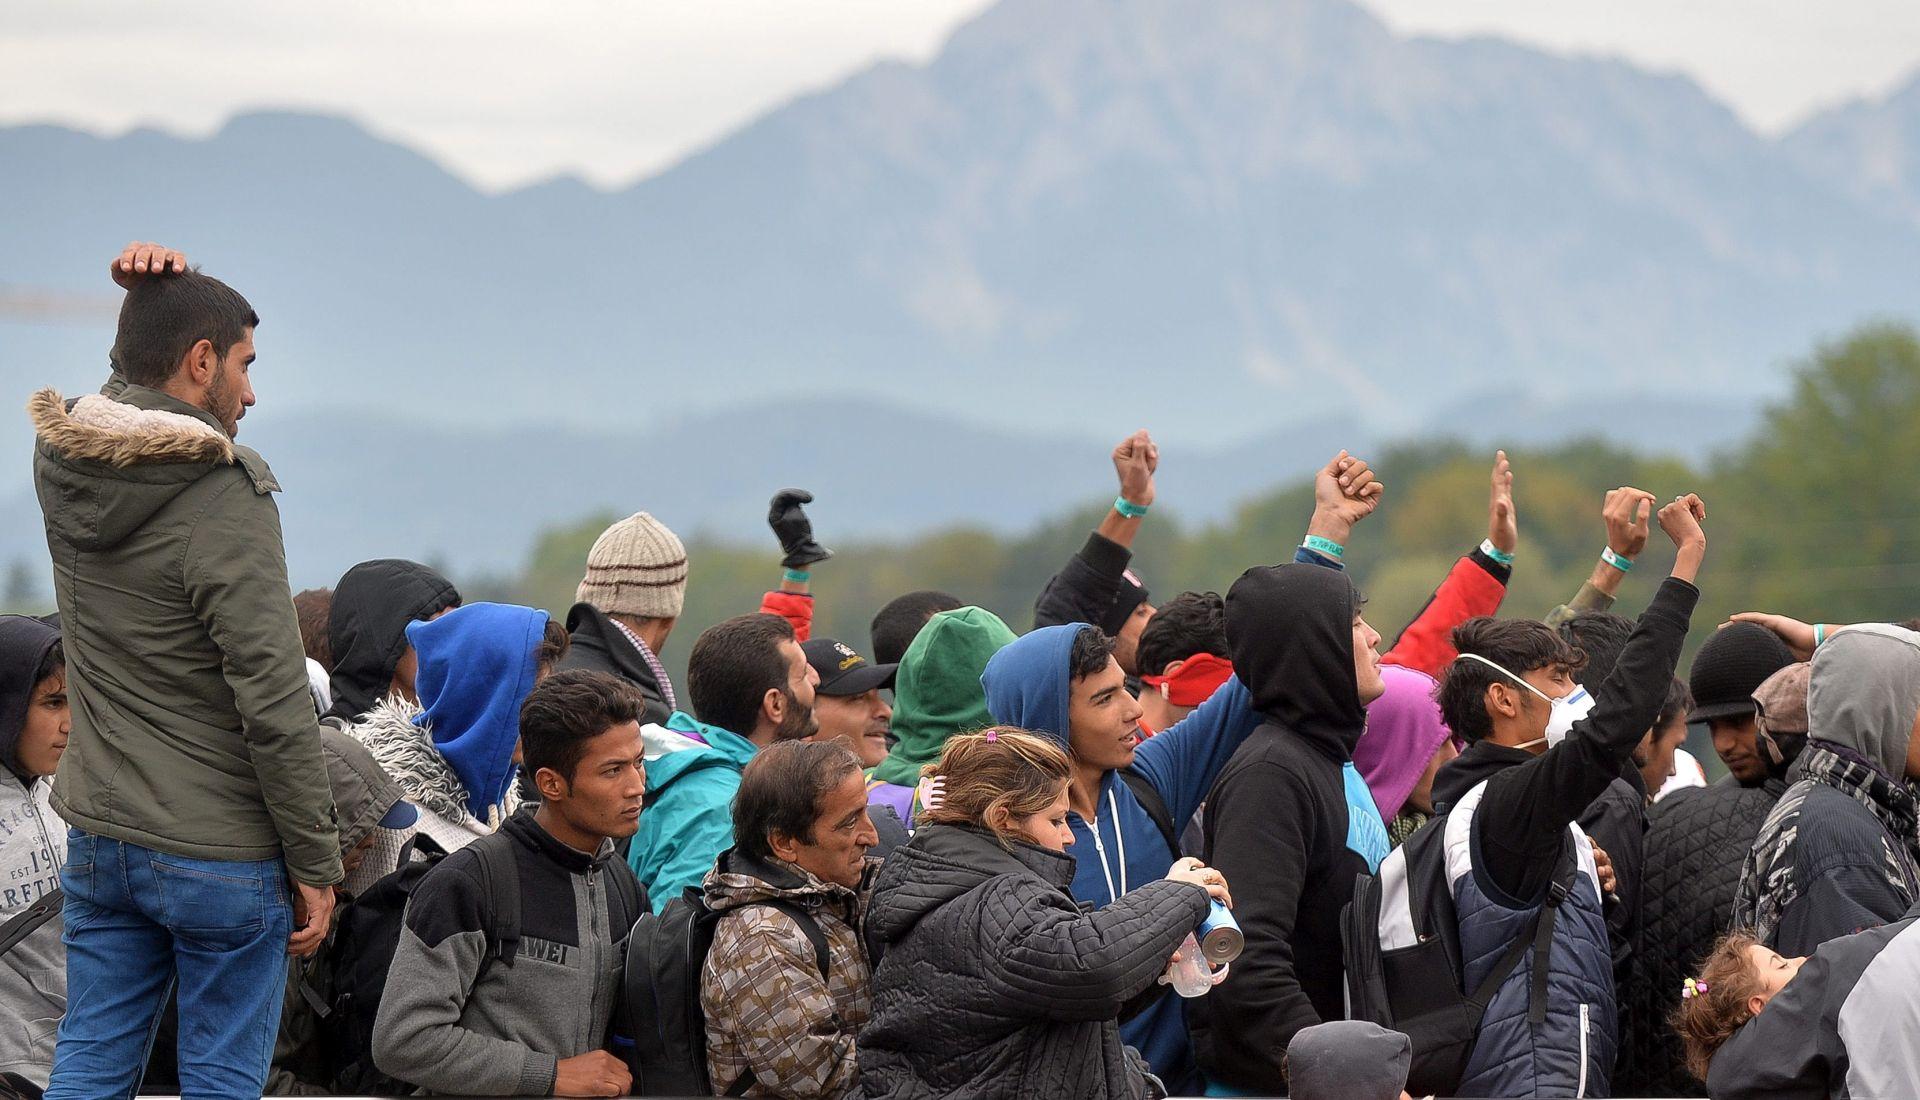 Španjolska strahuje da se migracijski val poslije Balkana ne preseli na zapadni Mediteran